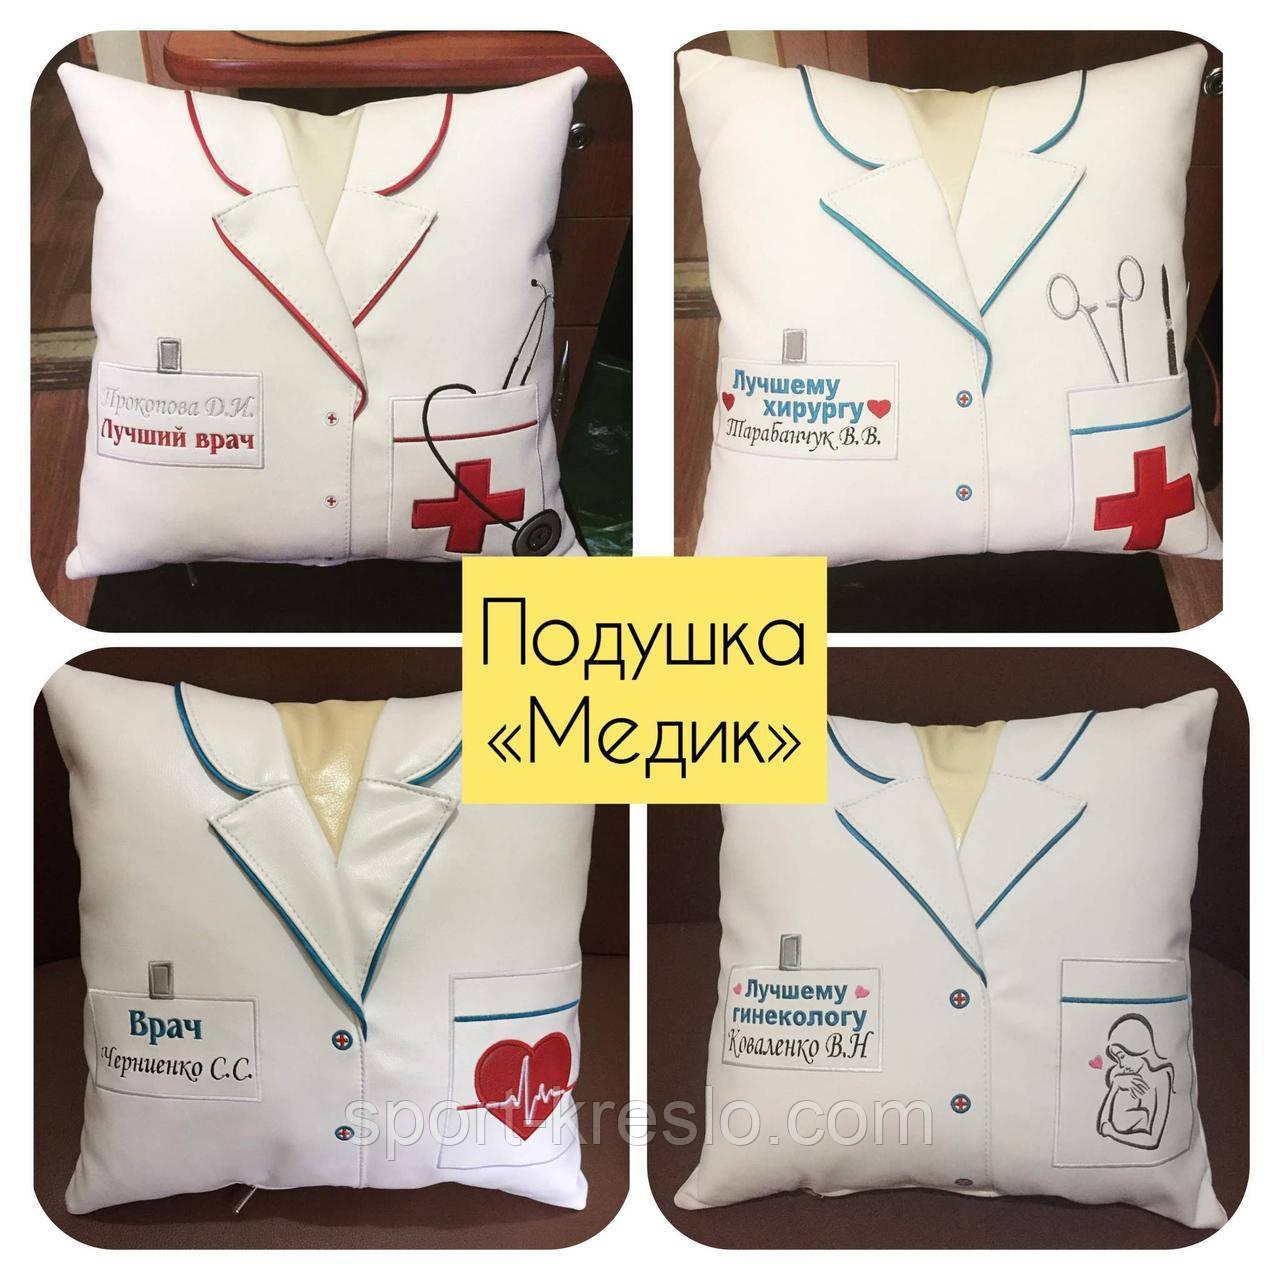 Подарок униформа медику, врачу, моряку, капитану, полицейскому, сотруднику СБУ, пожарнику